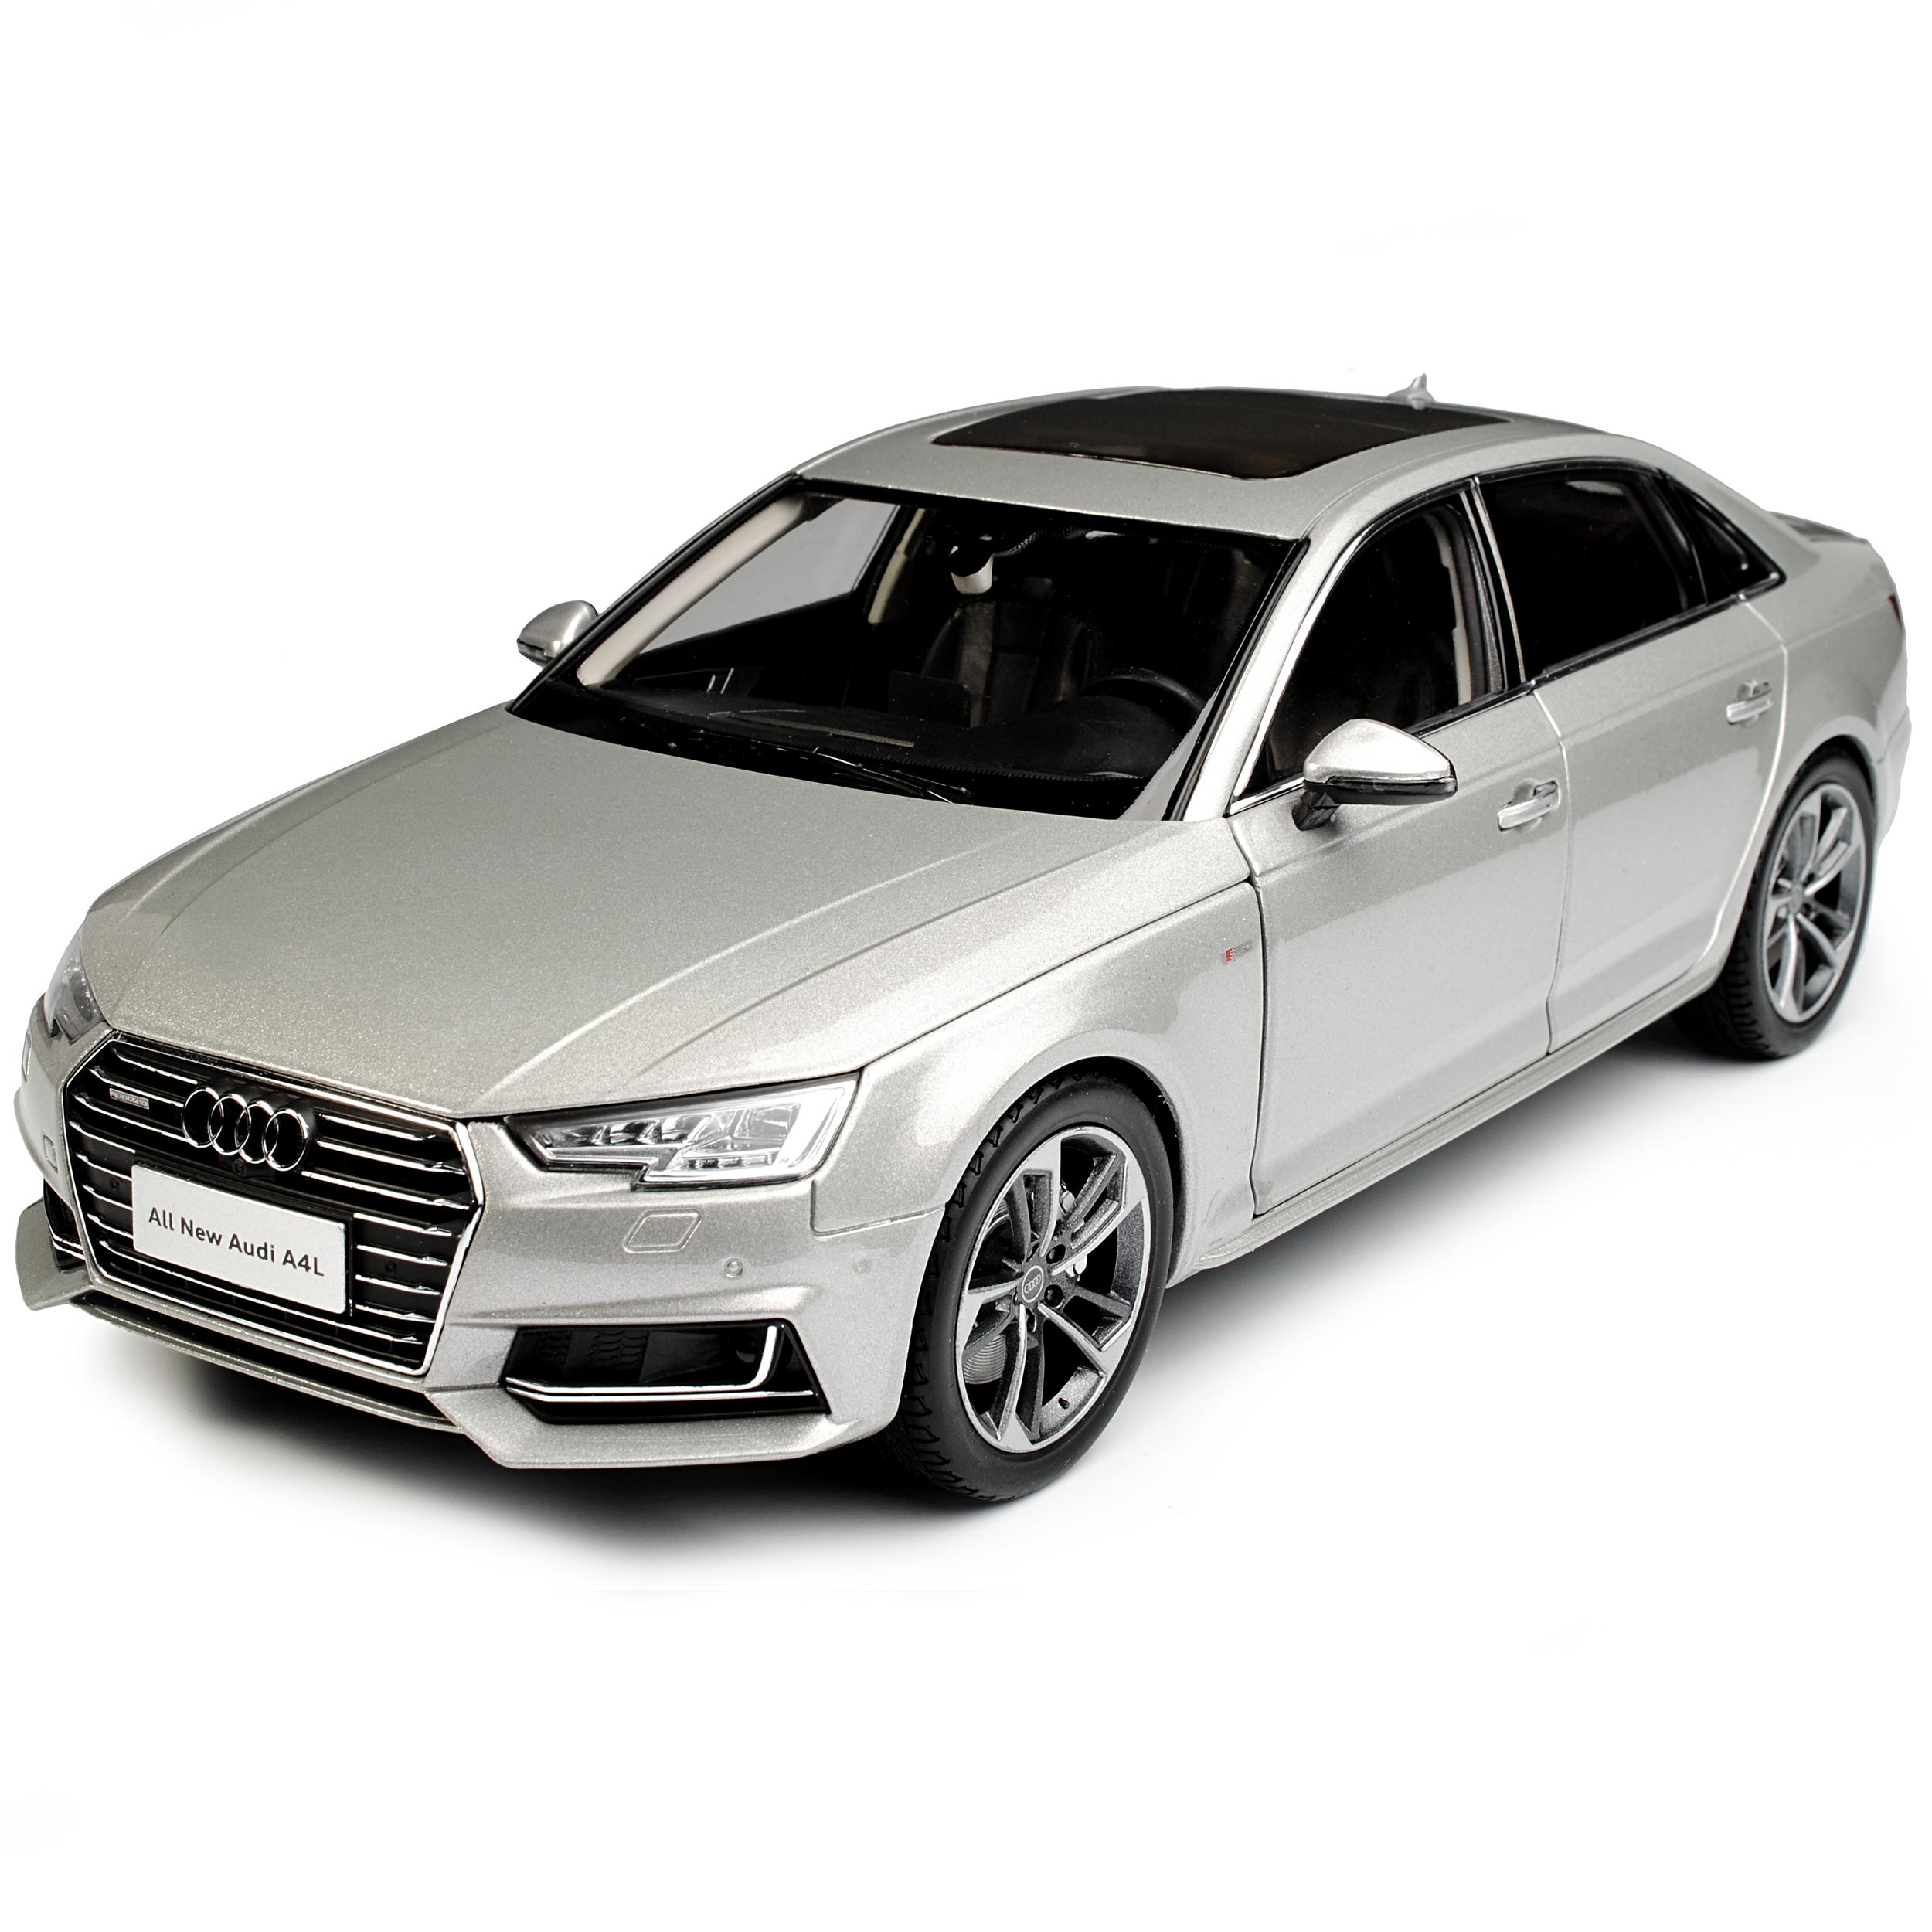 Audi A4 L B9 Limousine Silber Gold 5. Generation Ab 2015 1